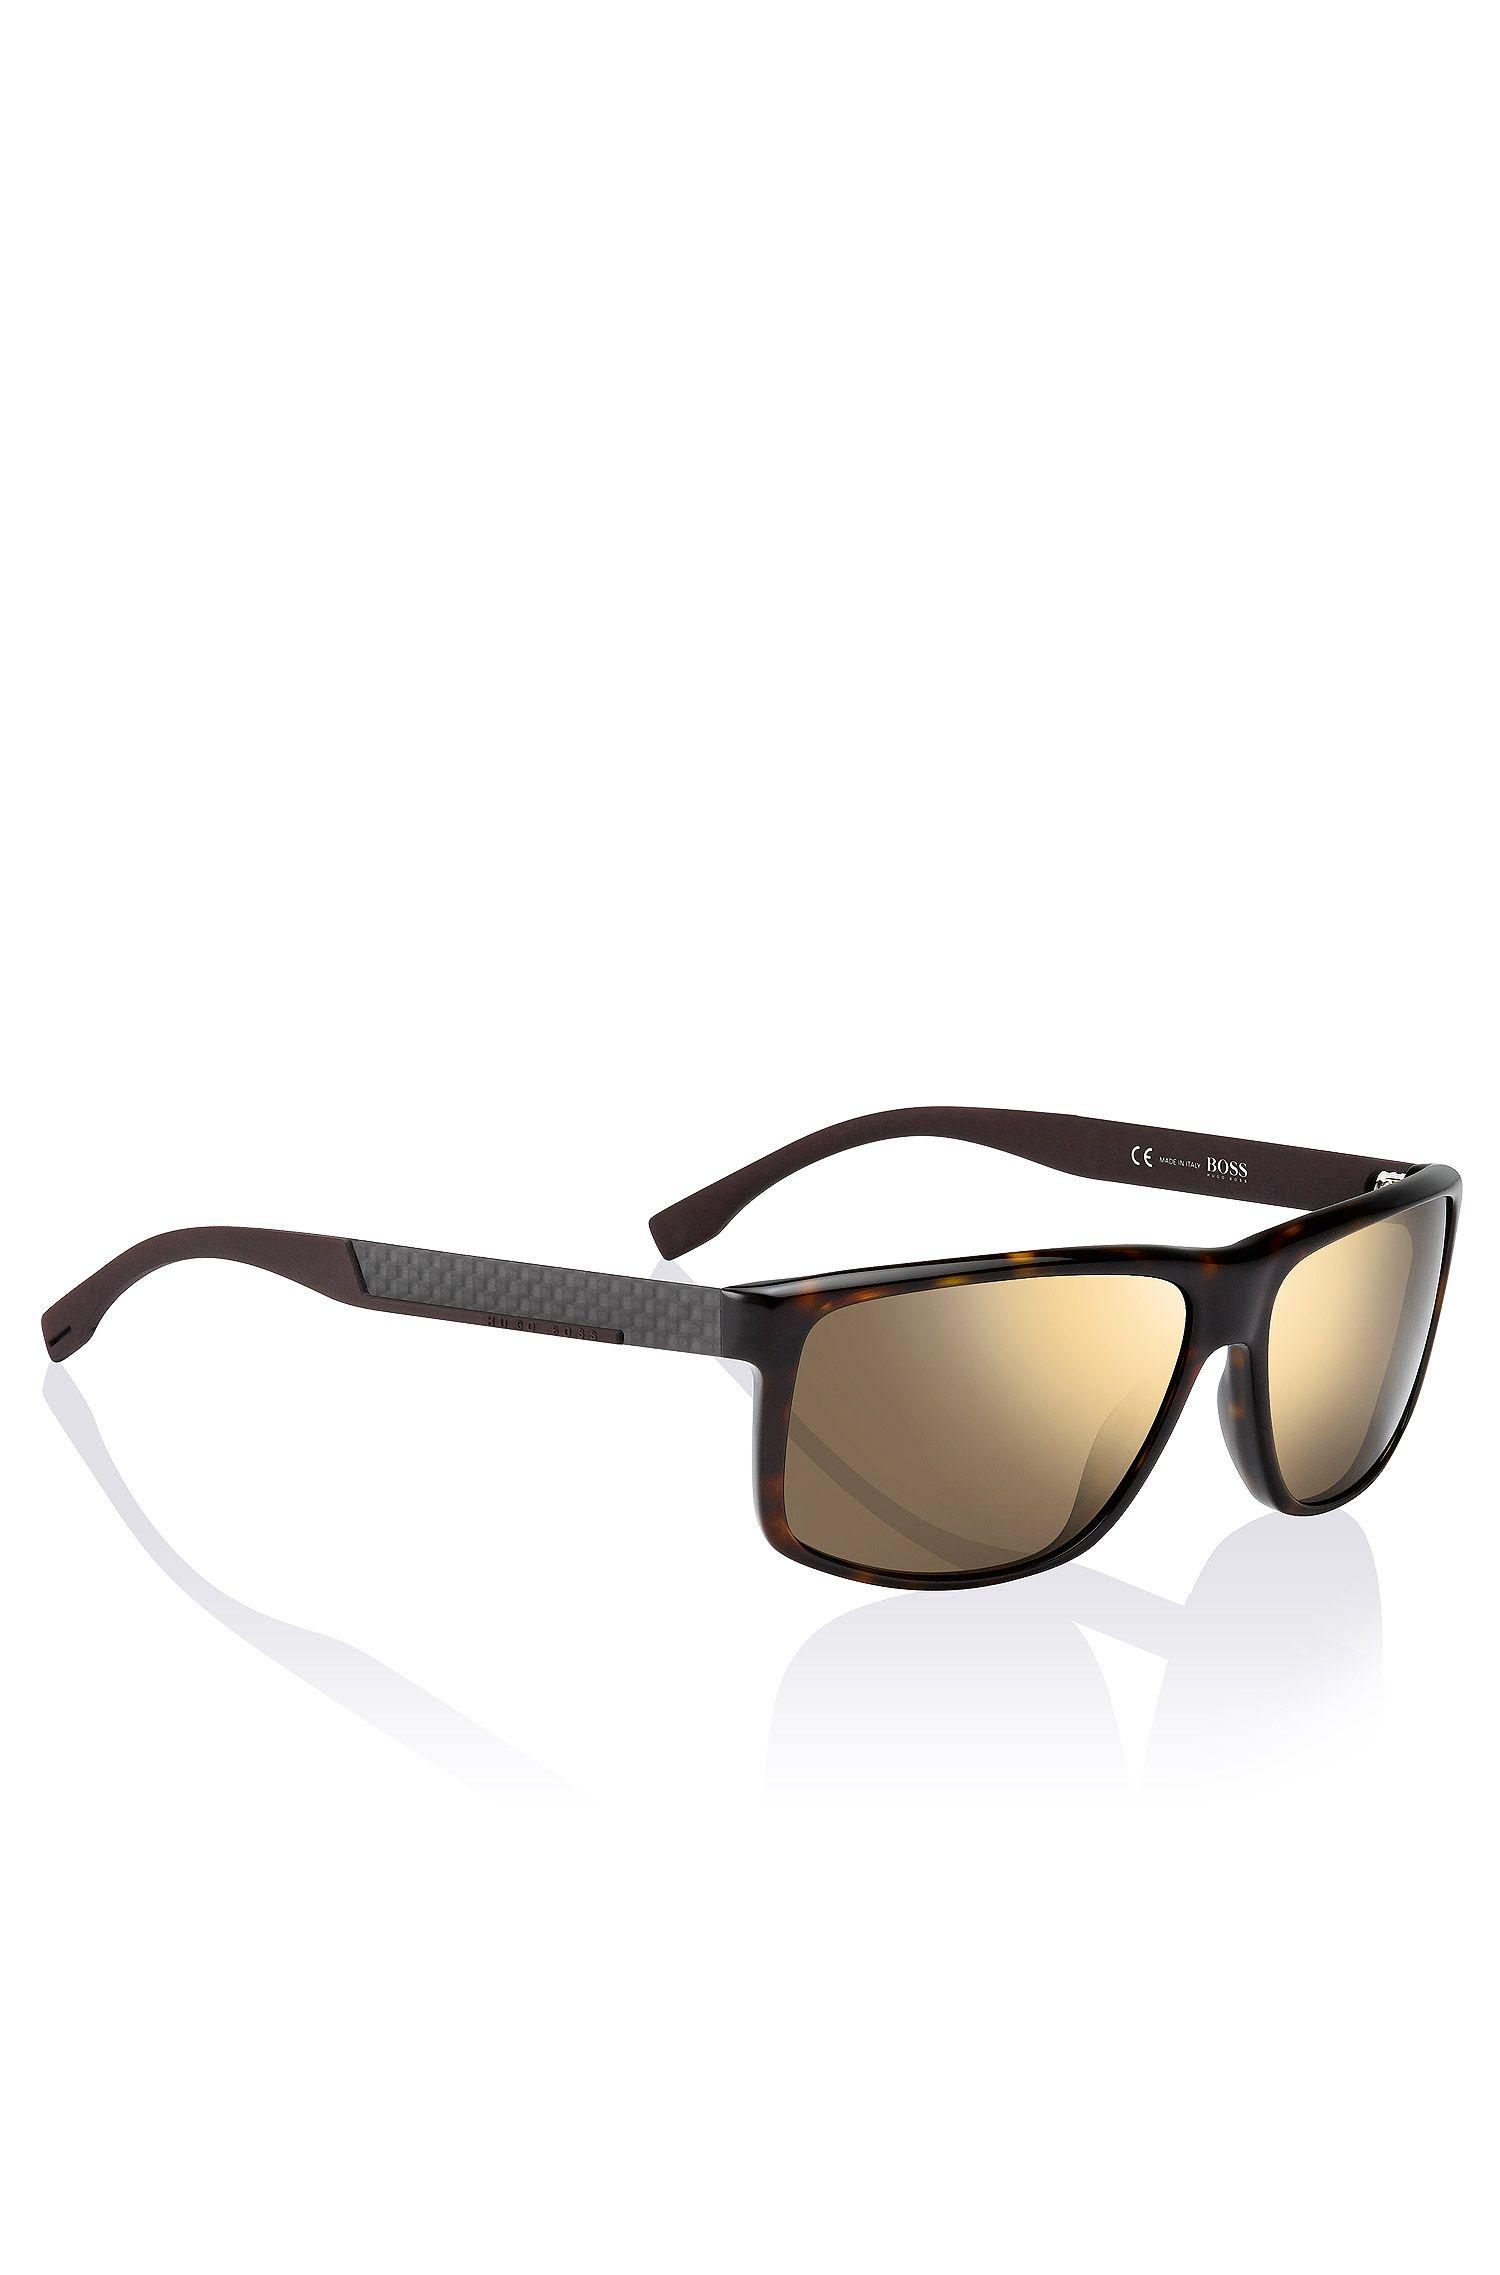 Sonnenbrille ´BOSS 0637/S`